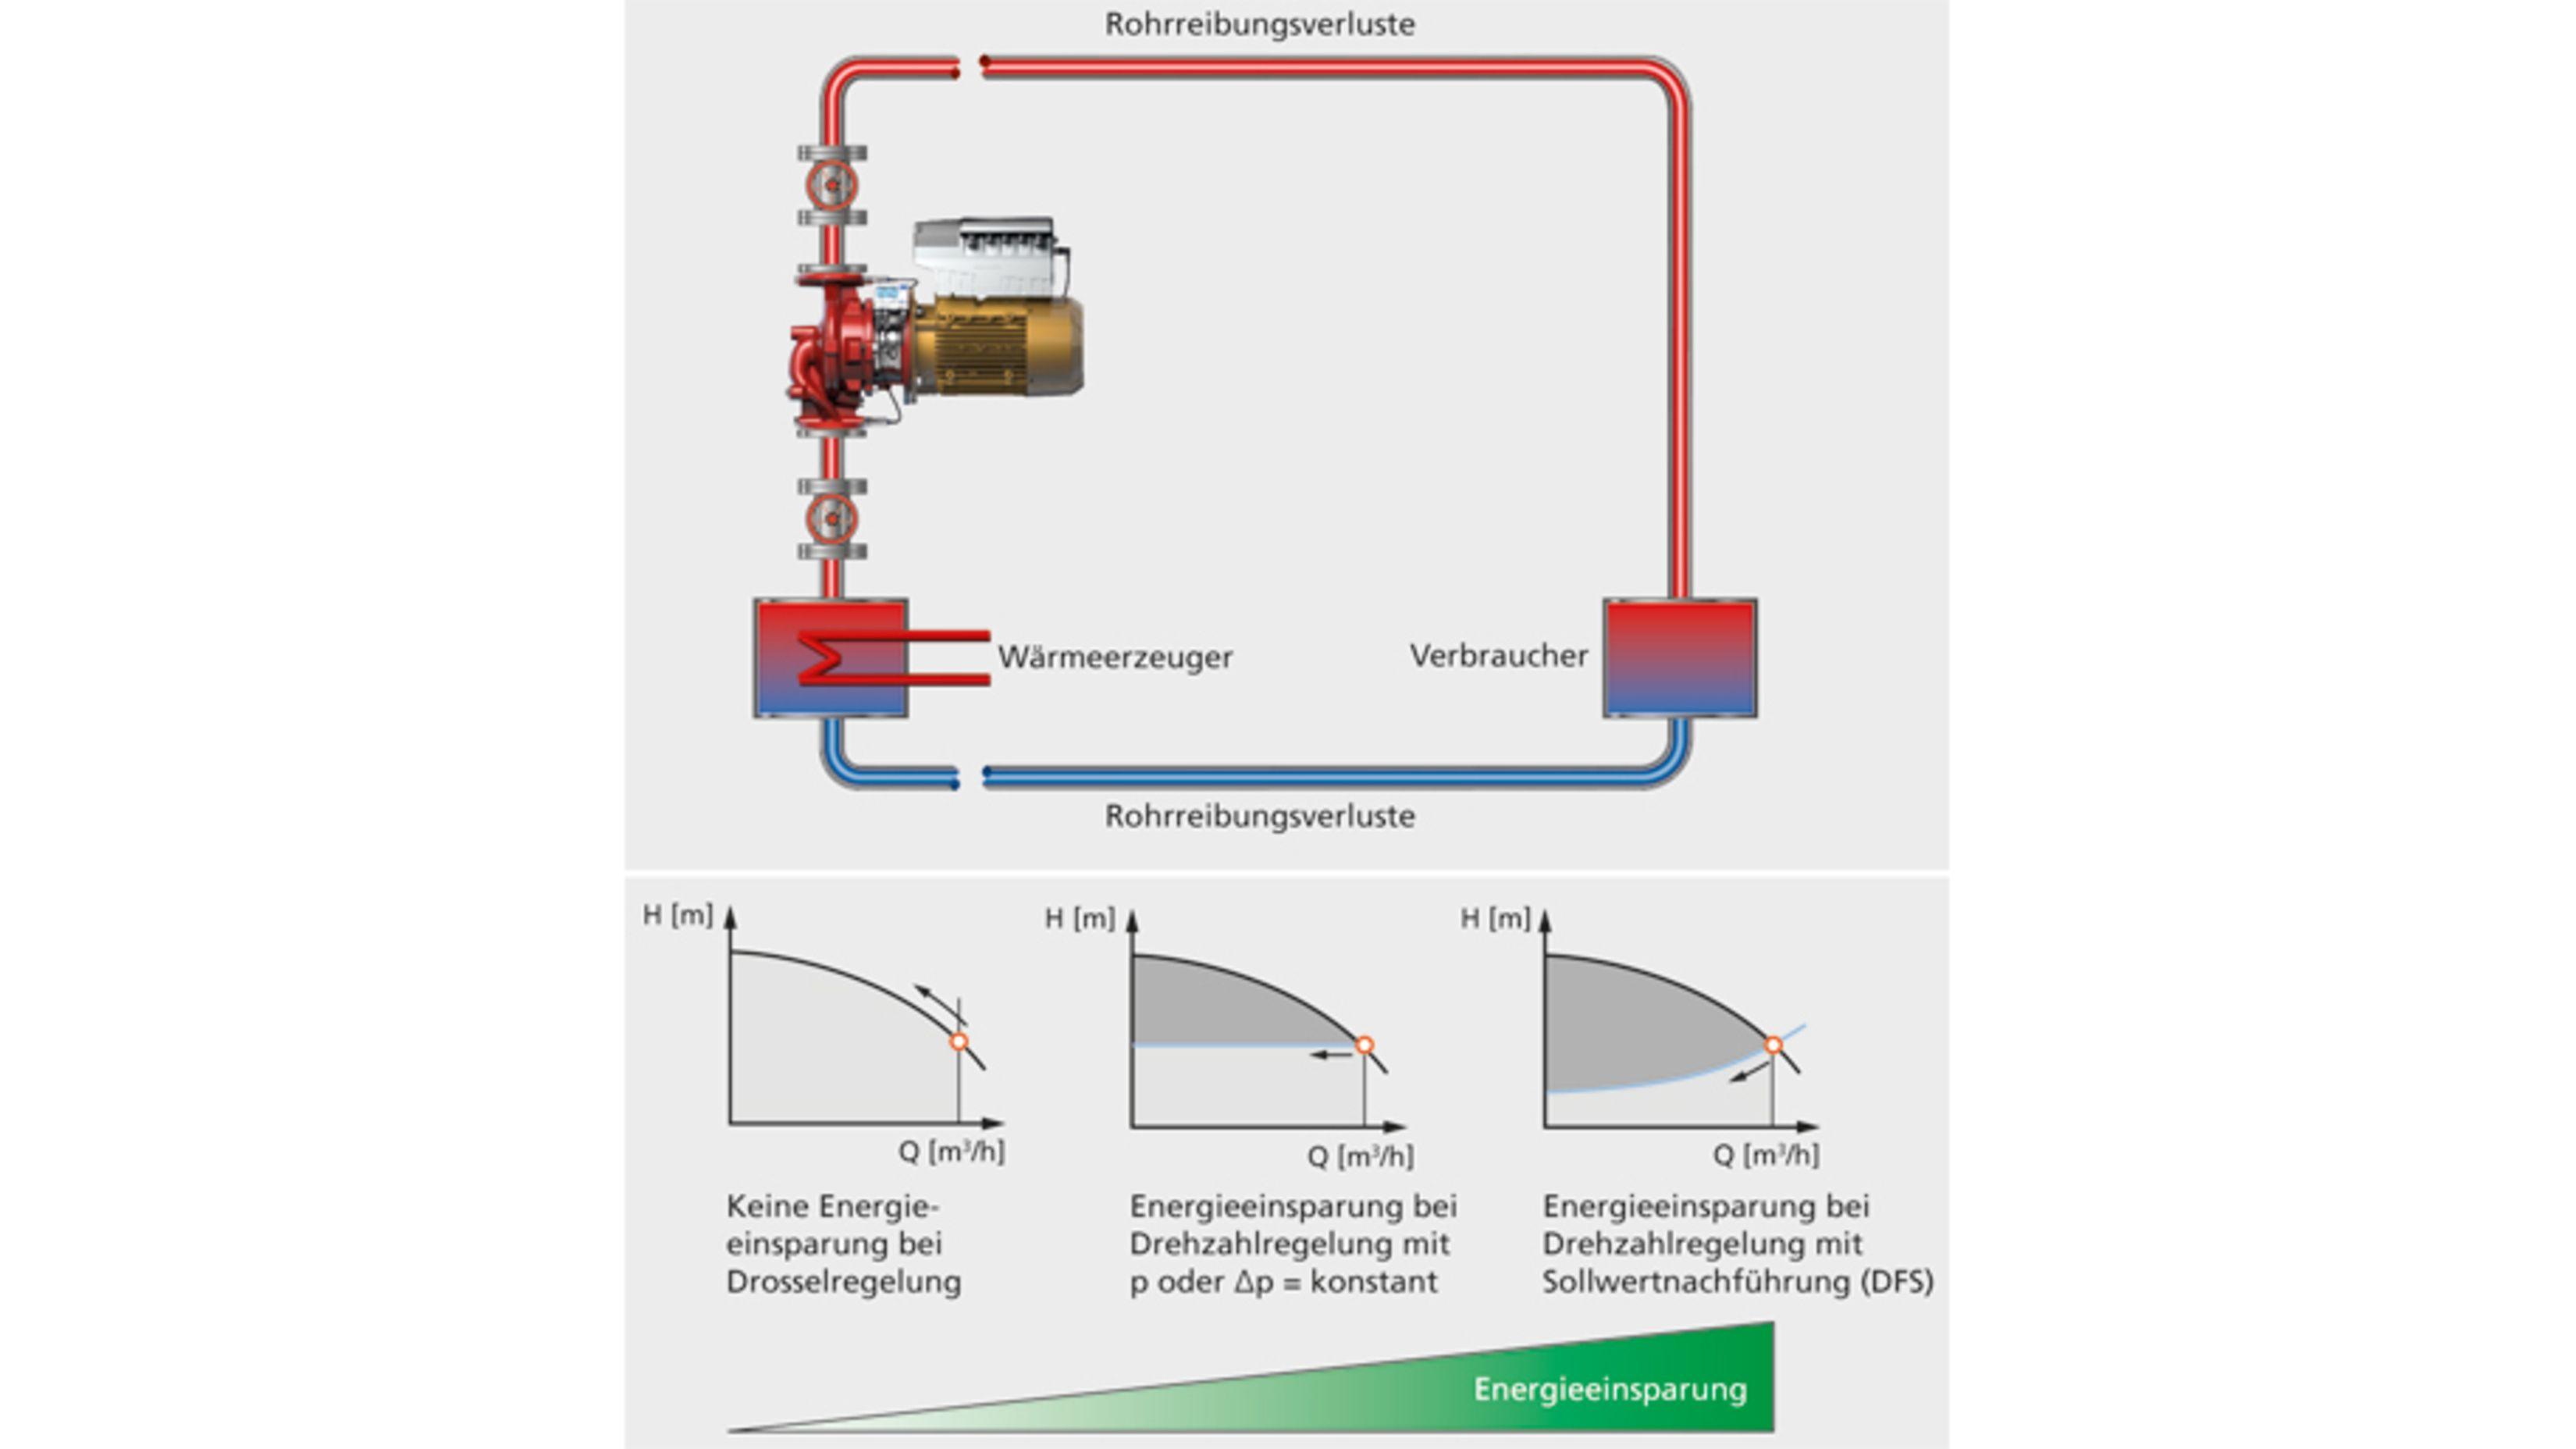 Compensates for pressure losses: PumpDrive's dynamic pressure compensation function